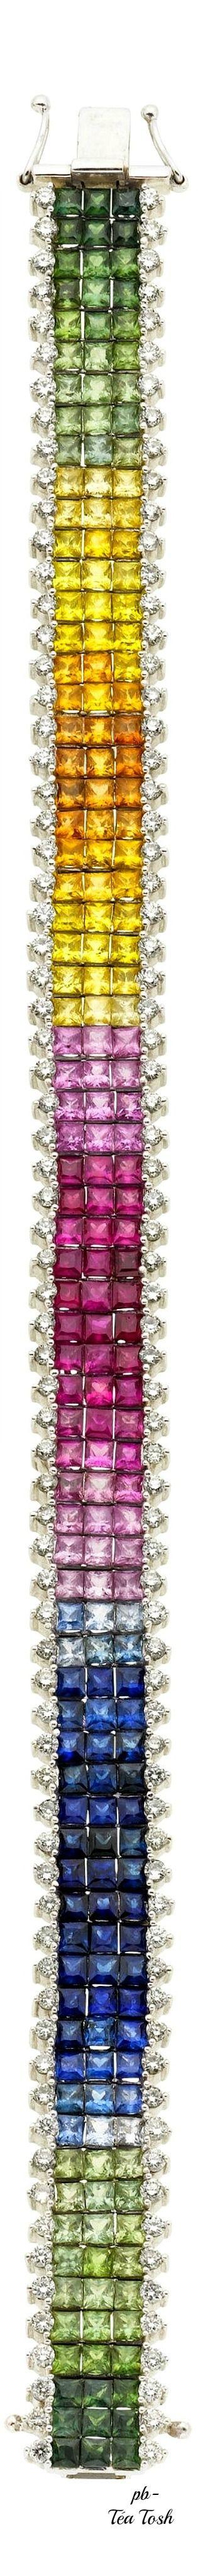 ❇Téa Tosh❇ ... Rainbow sapphire gemstone and diamond bracelet ❤️